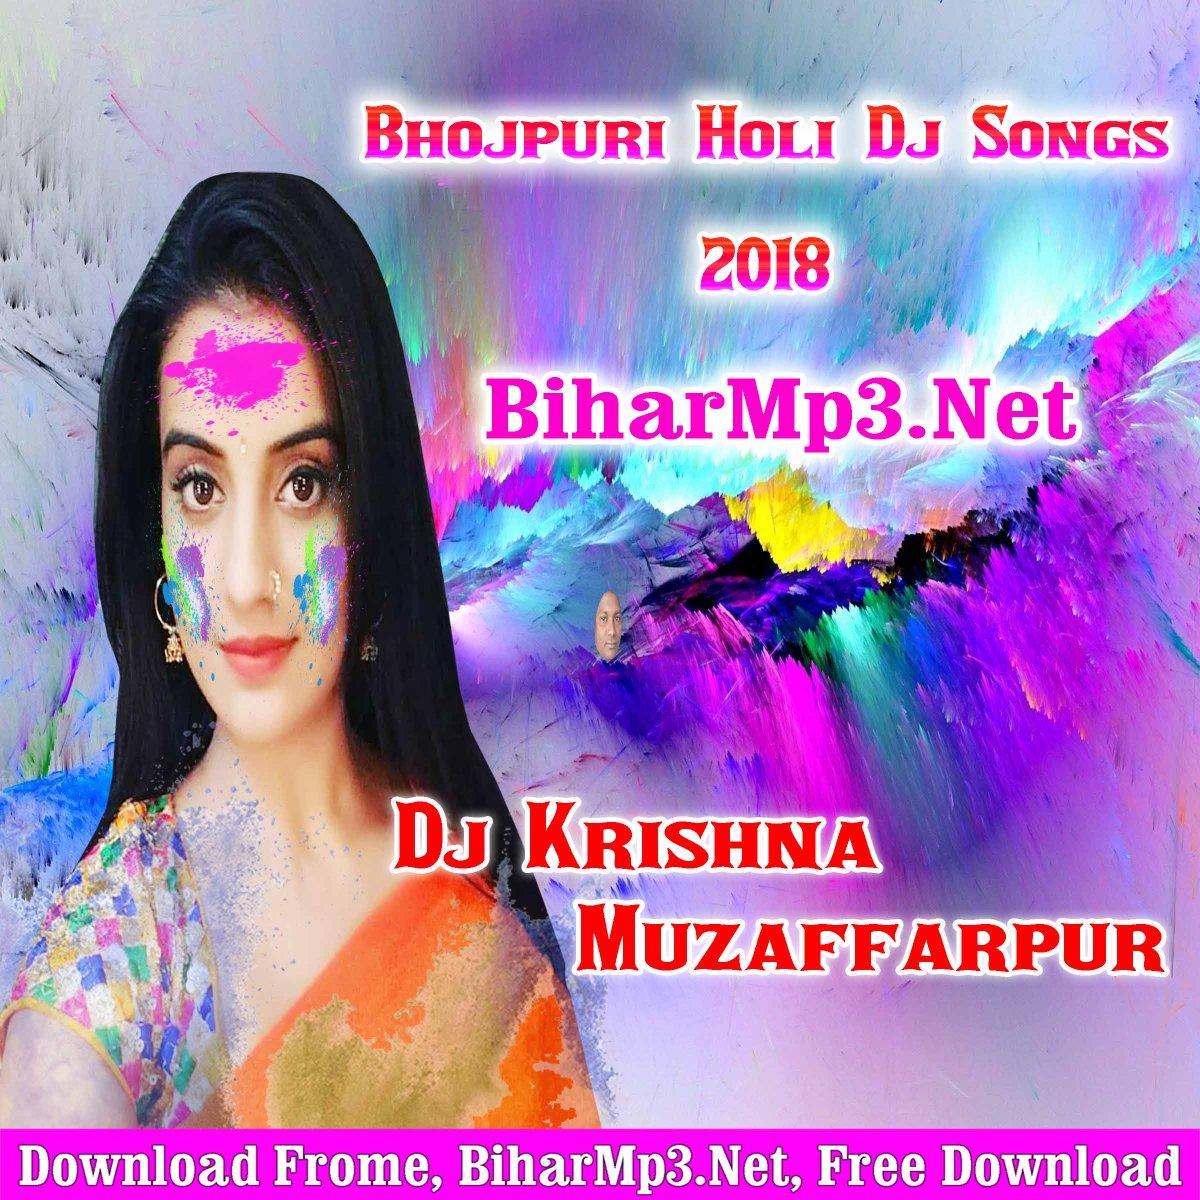 BiharMp3 Net (@biharmp3_net) | Twitter